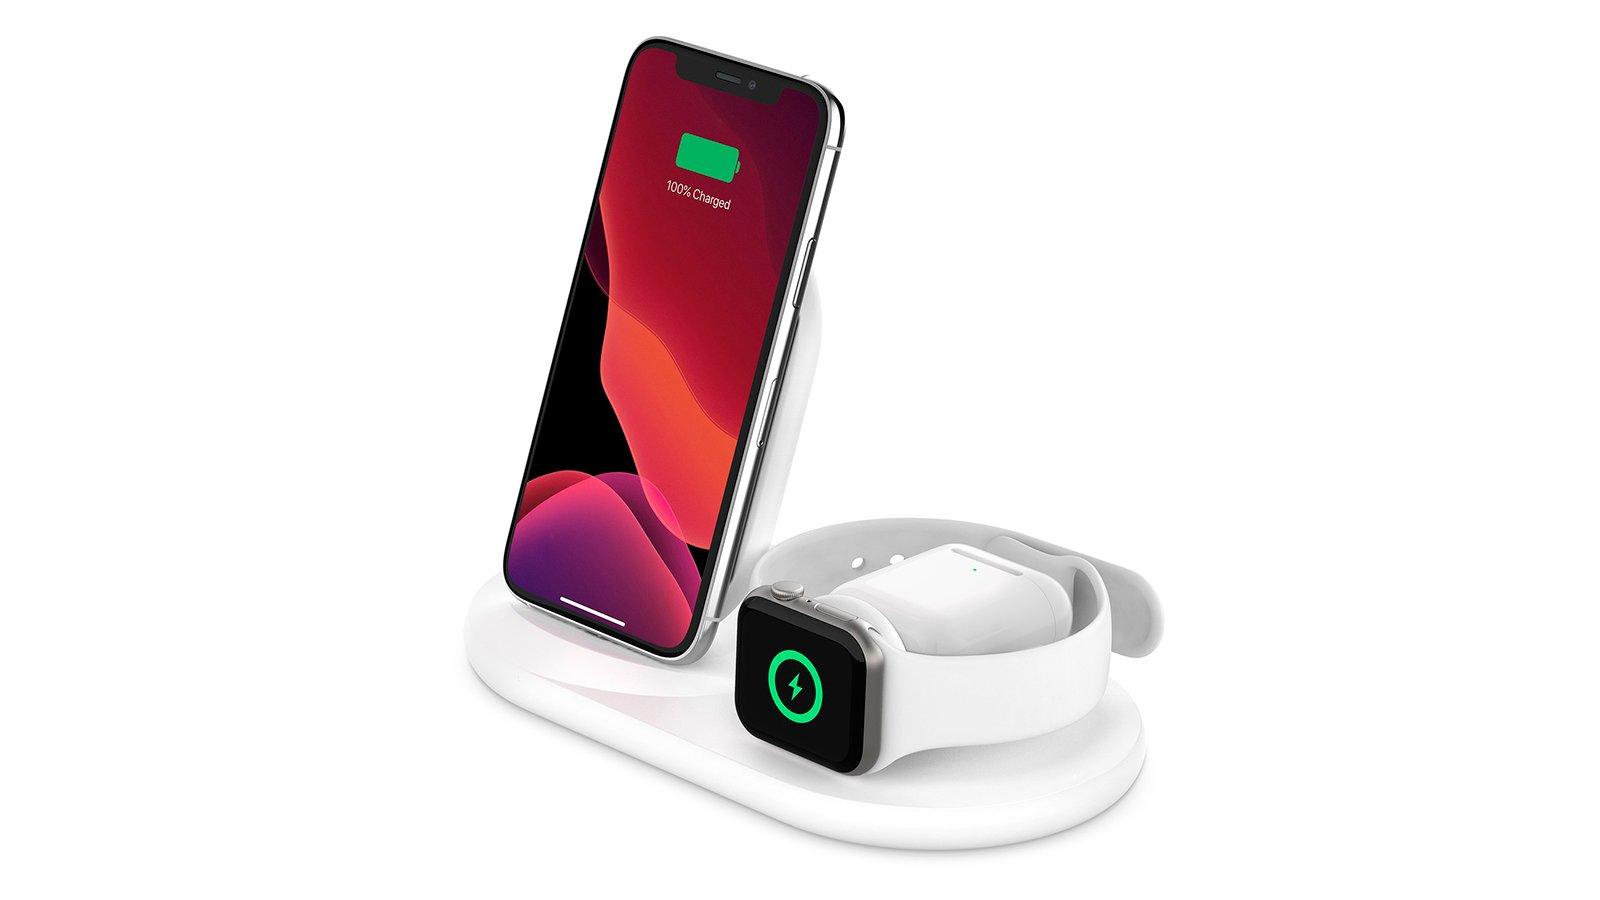 Док-станция Belkin Boost Charge может одновременно заряжать iPhone, Apple Watch и AirPods